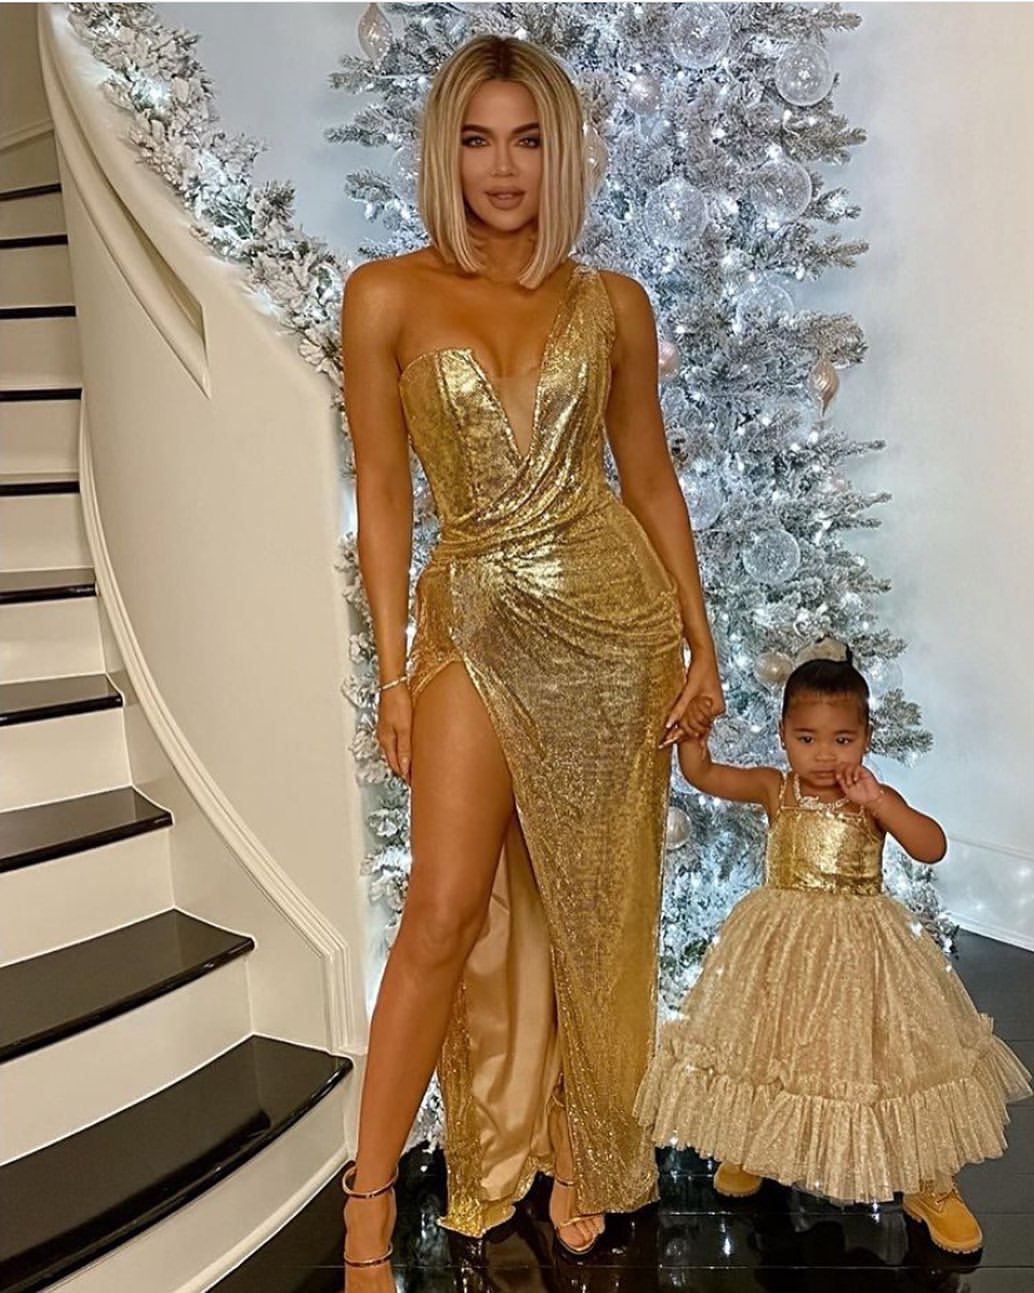 khloe-kardashian-true-thompson-in-bryan-hearns-christmas-2019